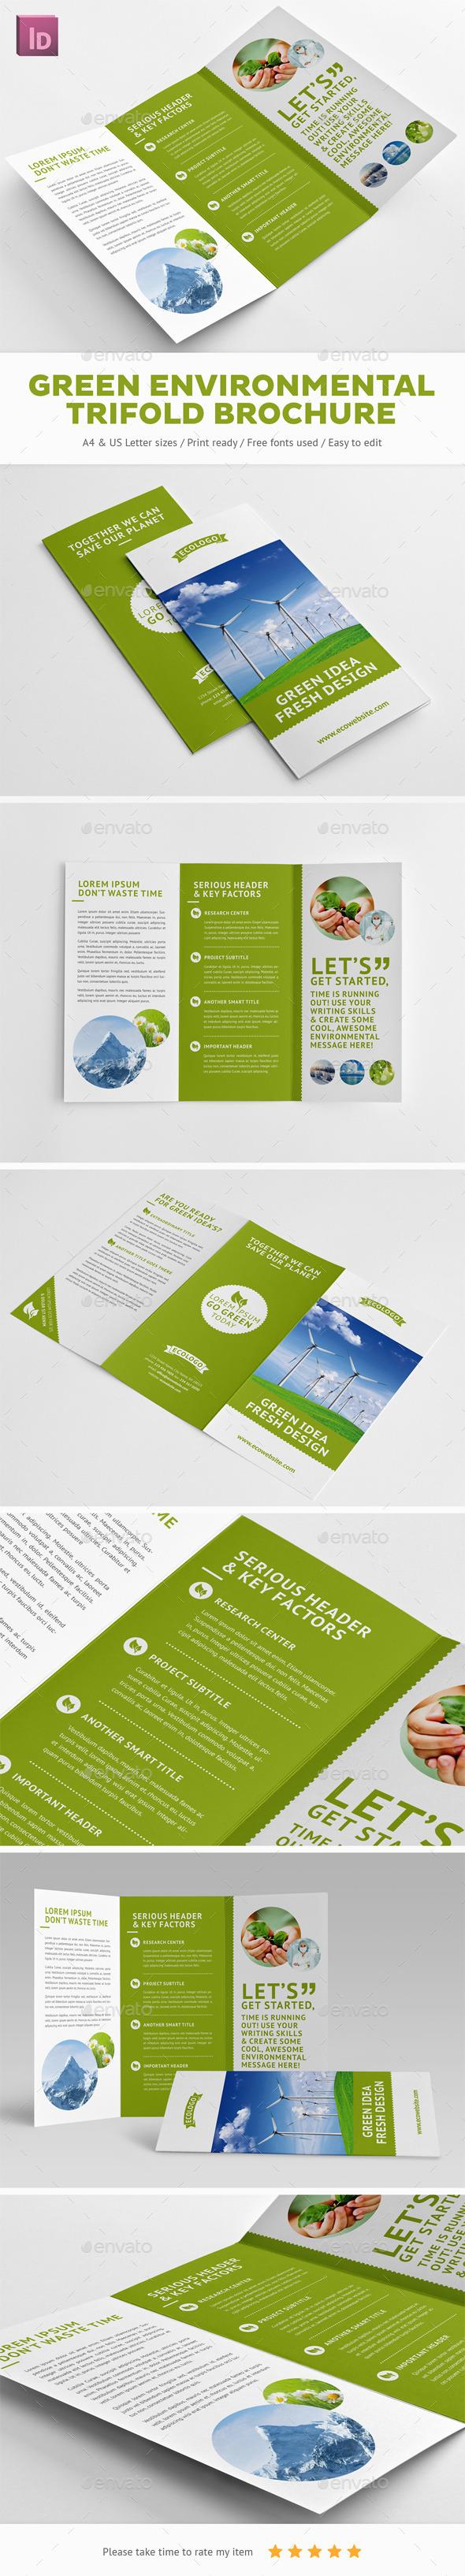 Green Environmental Trifold Brochure - Brochures Print Templates